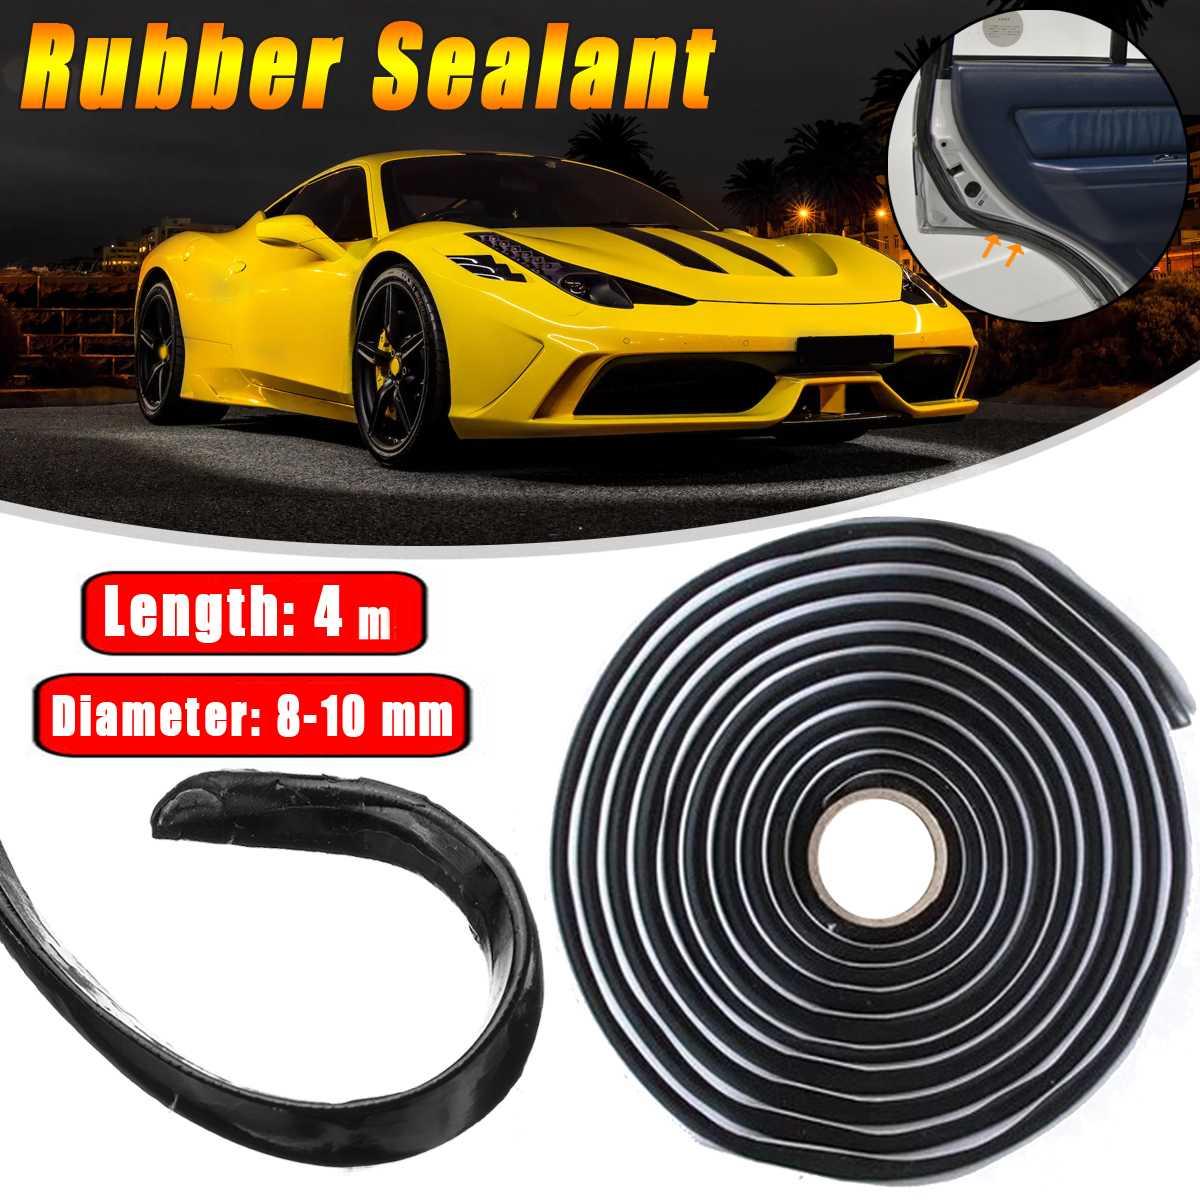 2x Car Rubber Sealant 4 Meters Butyl Glue Headlight Windshield Retrofit Reseal Hid Headlamps Taillight Shield Glue Tapes